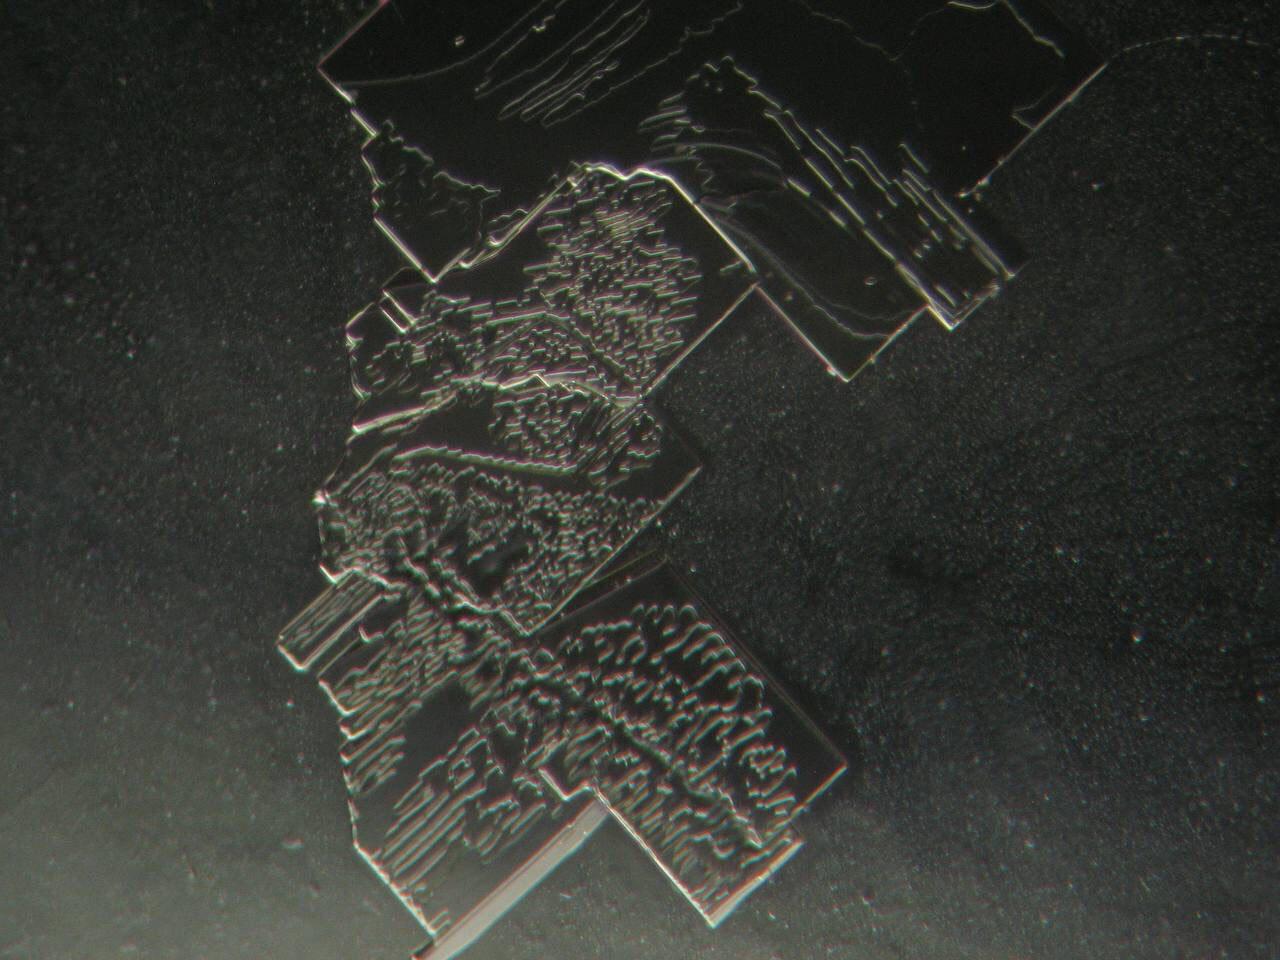 Getrockneter Impfstoff mit seltsam technisch anmutender Struktur